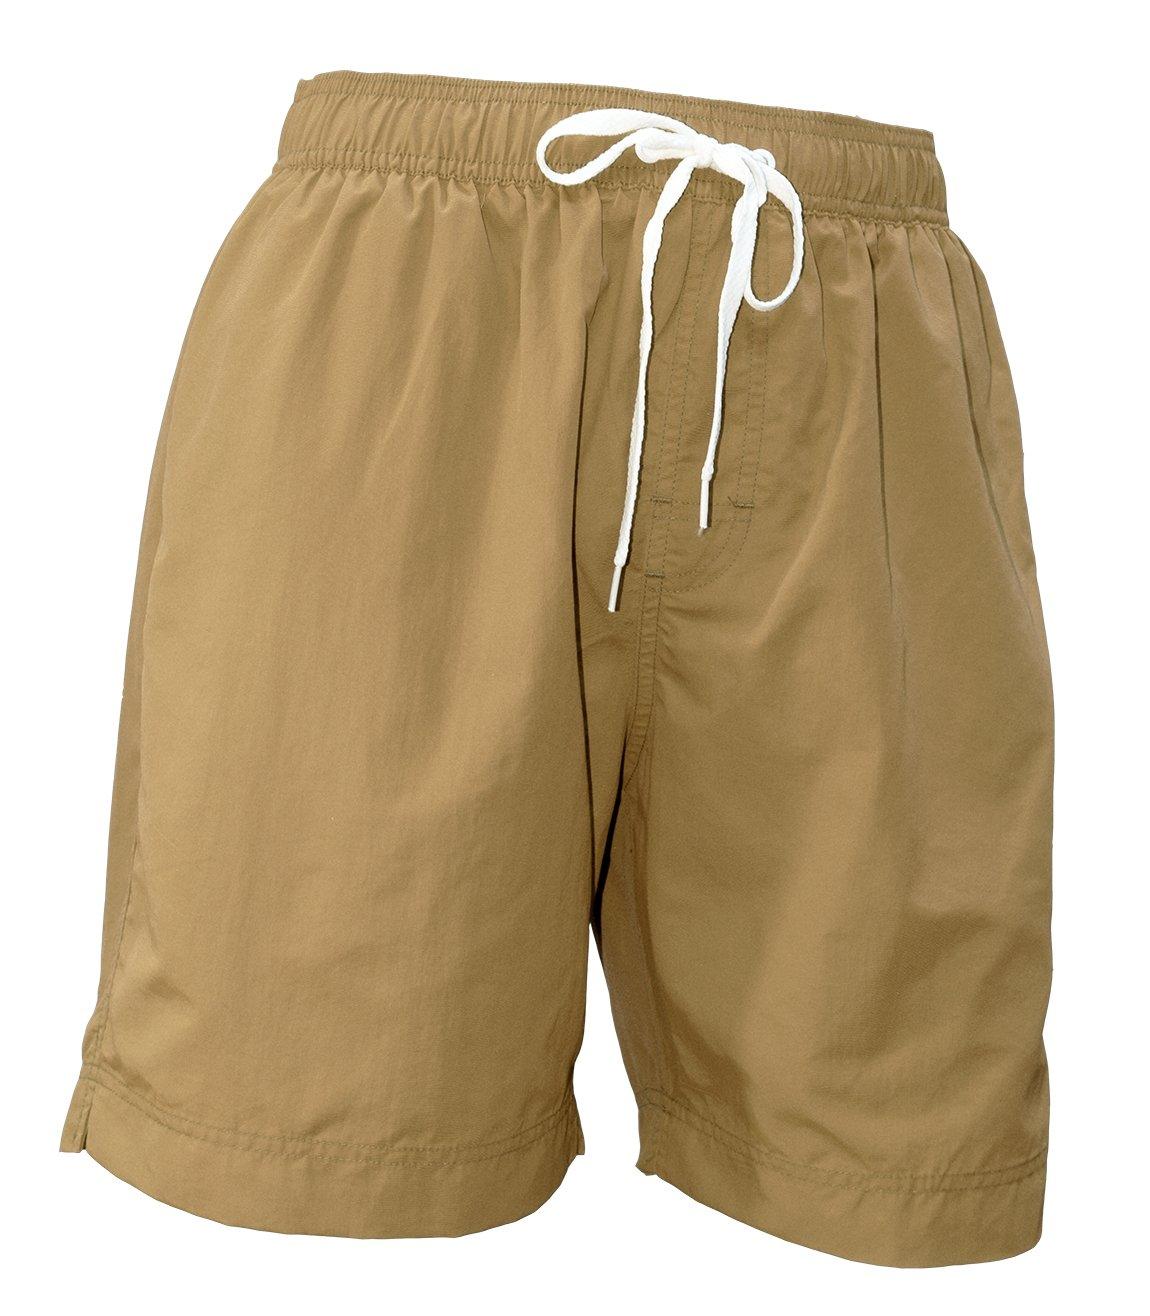 2a371986b3 Amazon.com: Adoretex Men's Swim Trunks Watershort Swimsuit with Mesh  Lining: Clothing